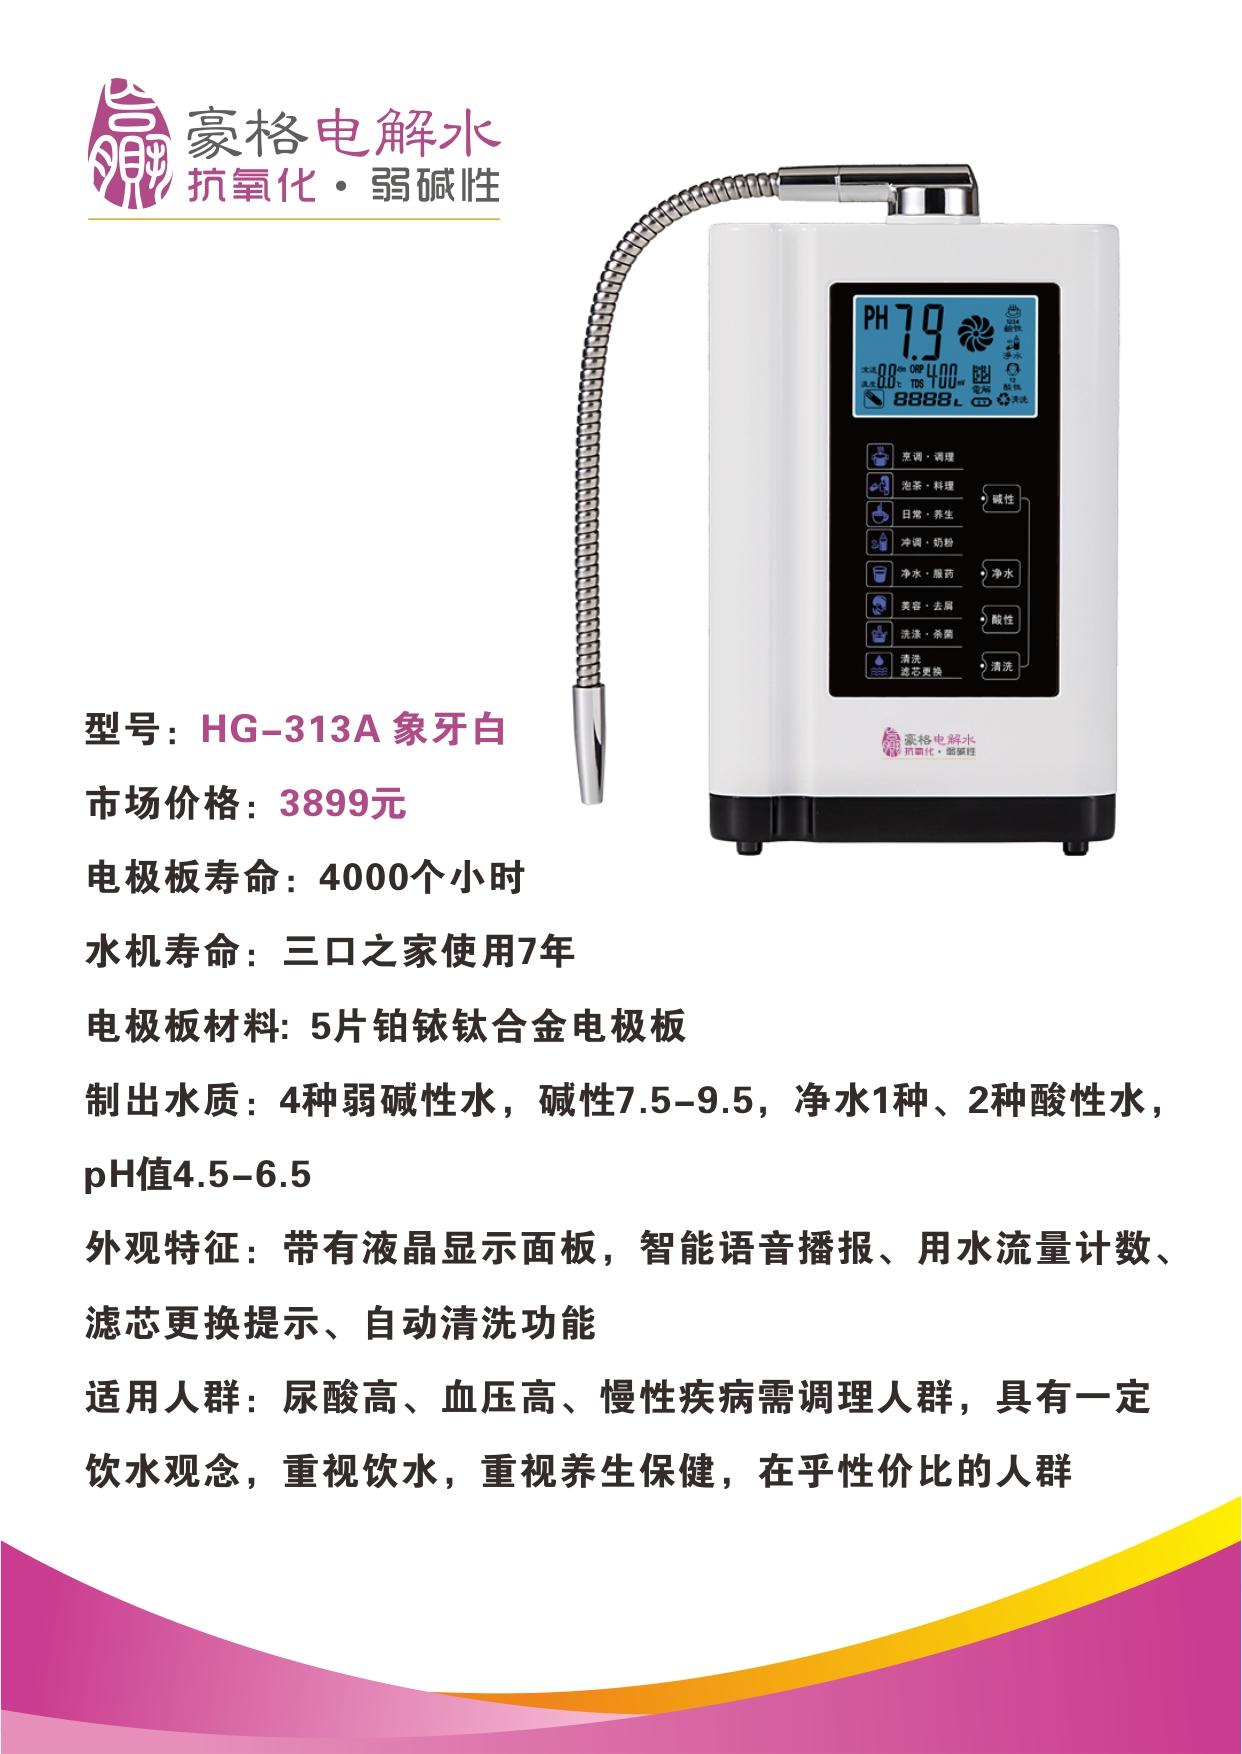 HG-313A 象牙白.jpg